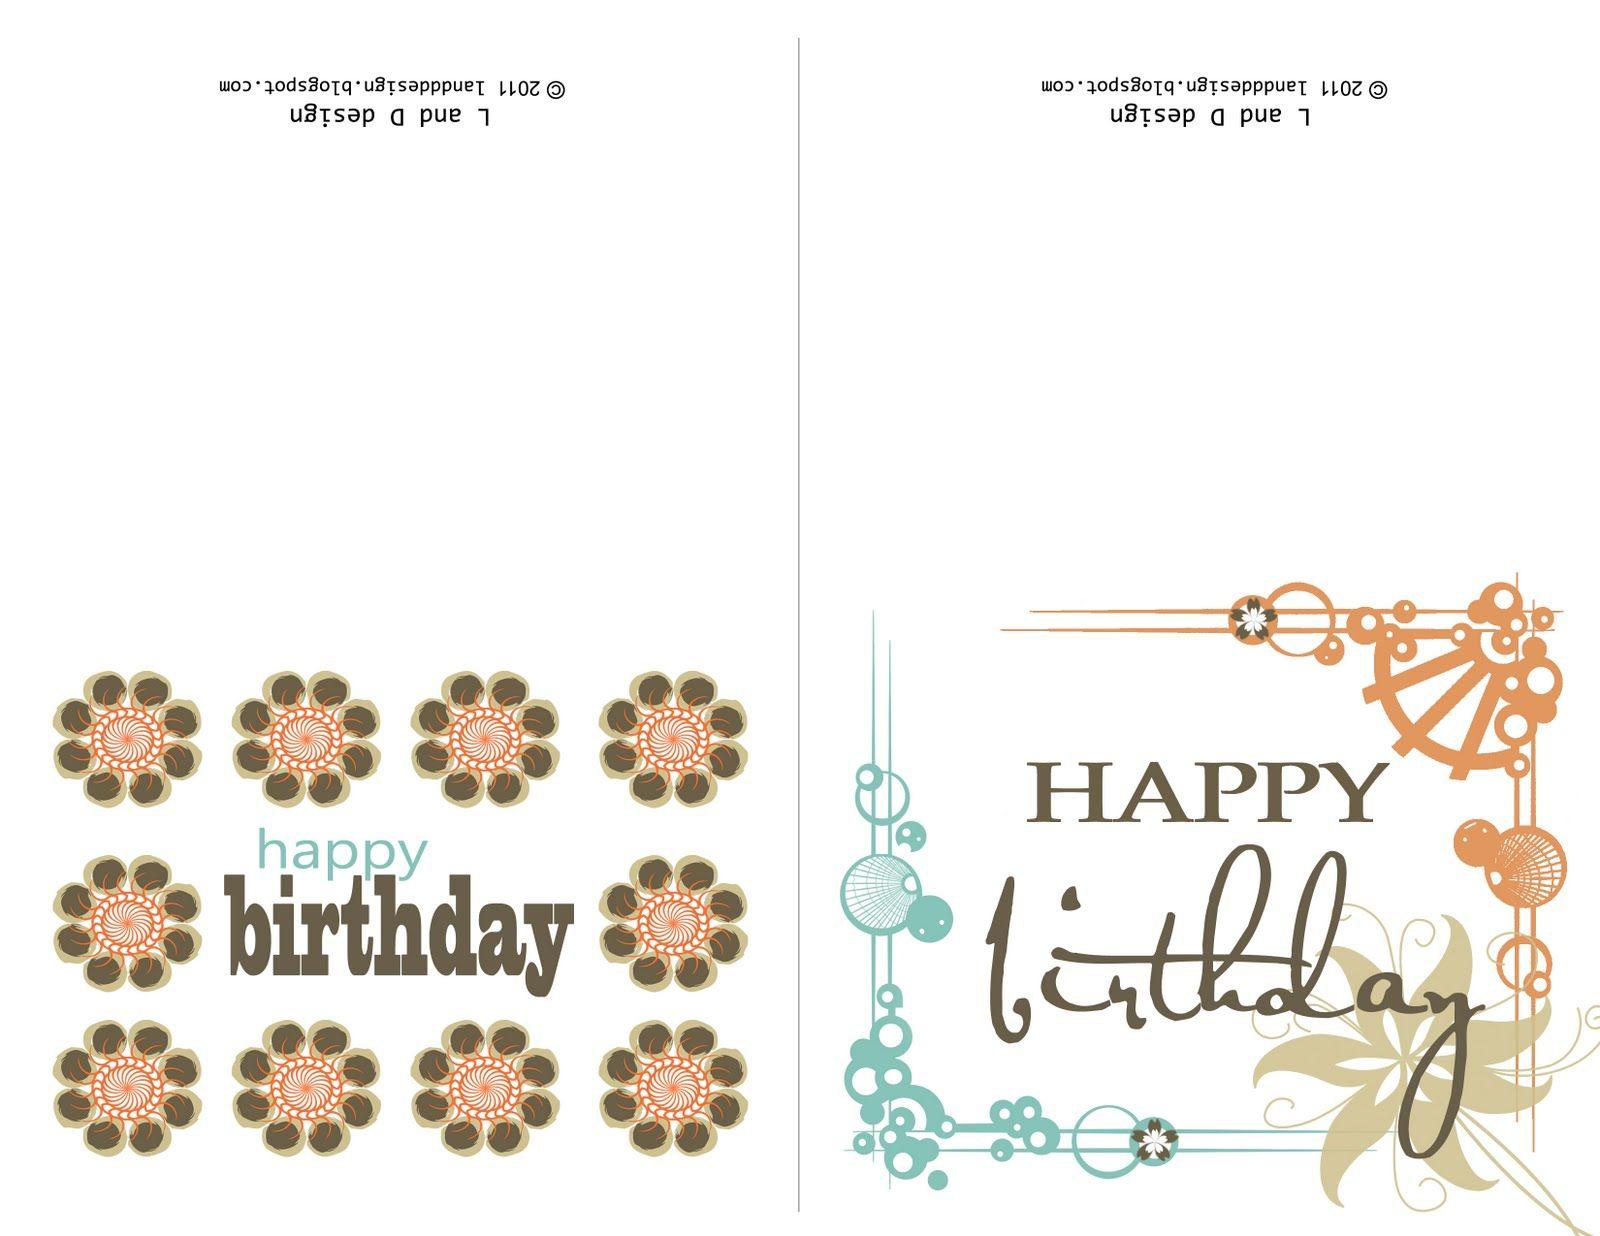 Printable Birthday Cards For Mom | Happy Birthday To You | Pinterest - Free Printable Birthday Cards For Mom